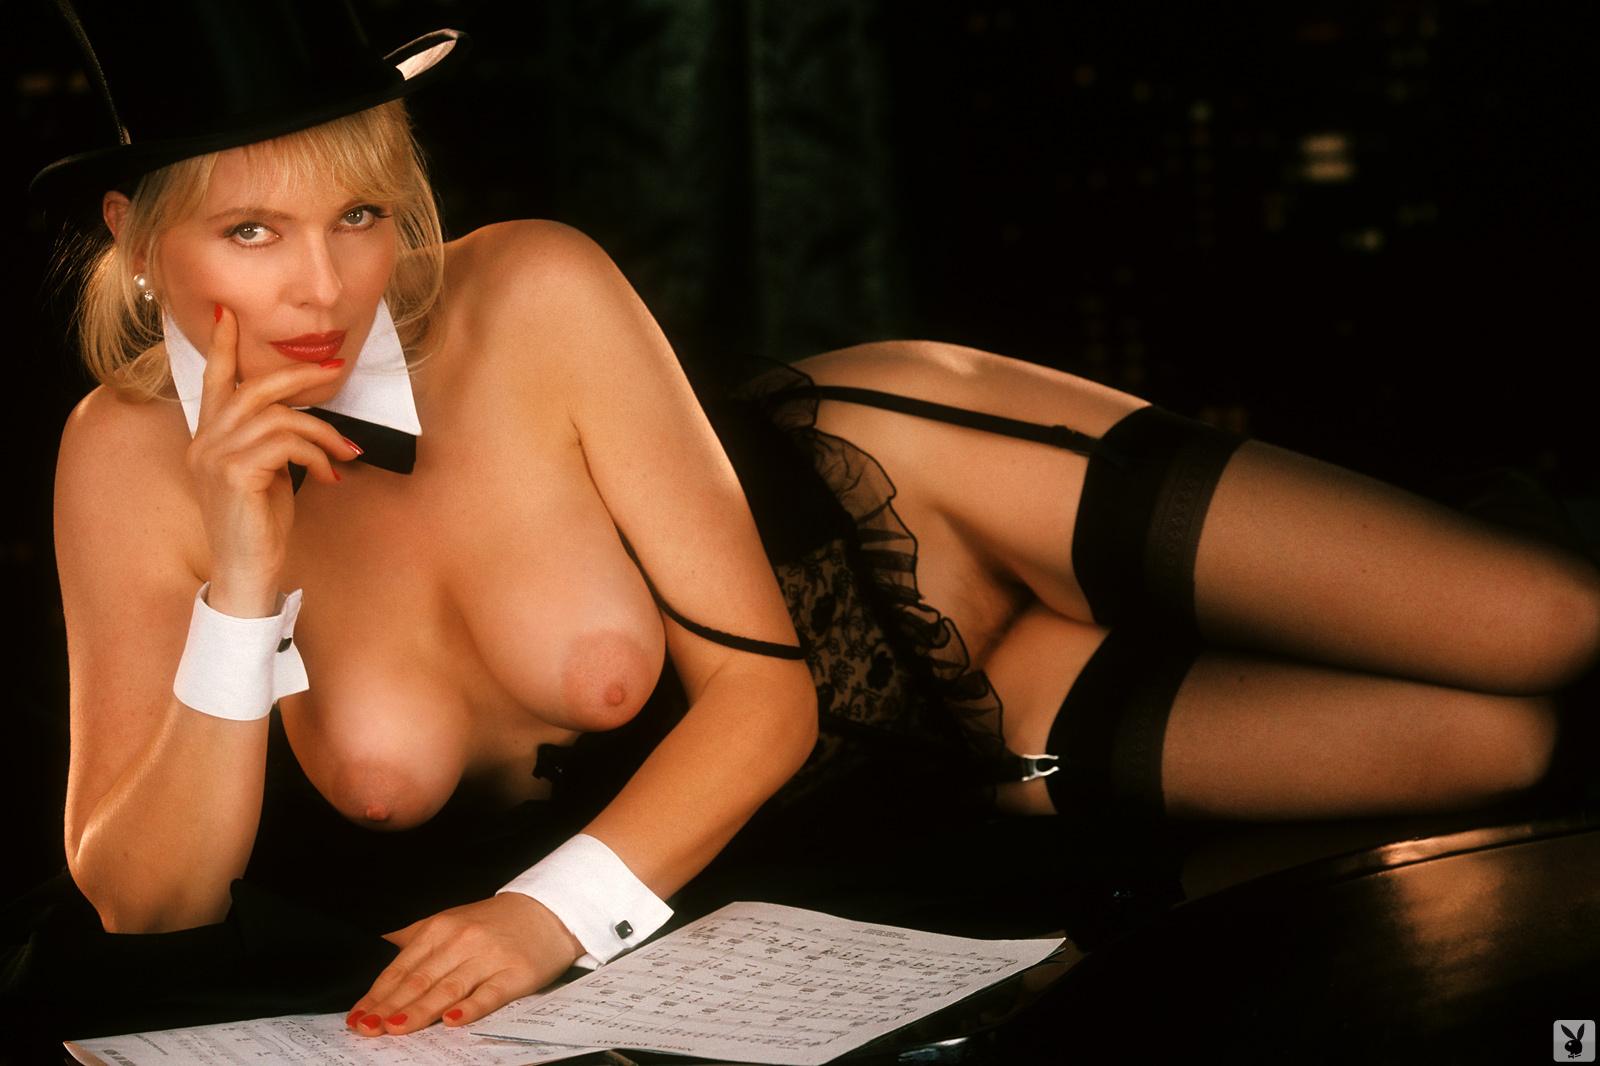 playmate revisited: lillian müller - playmates nudes | playboyplus